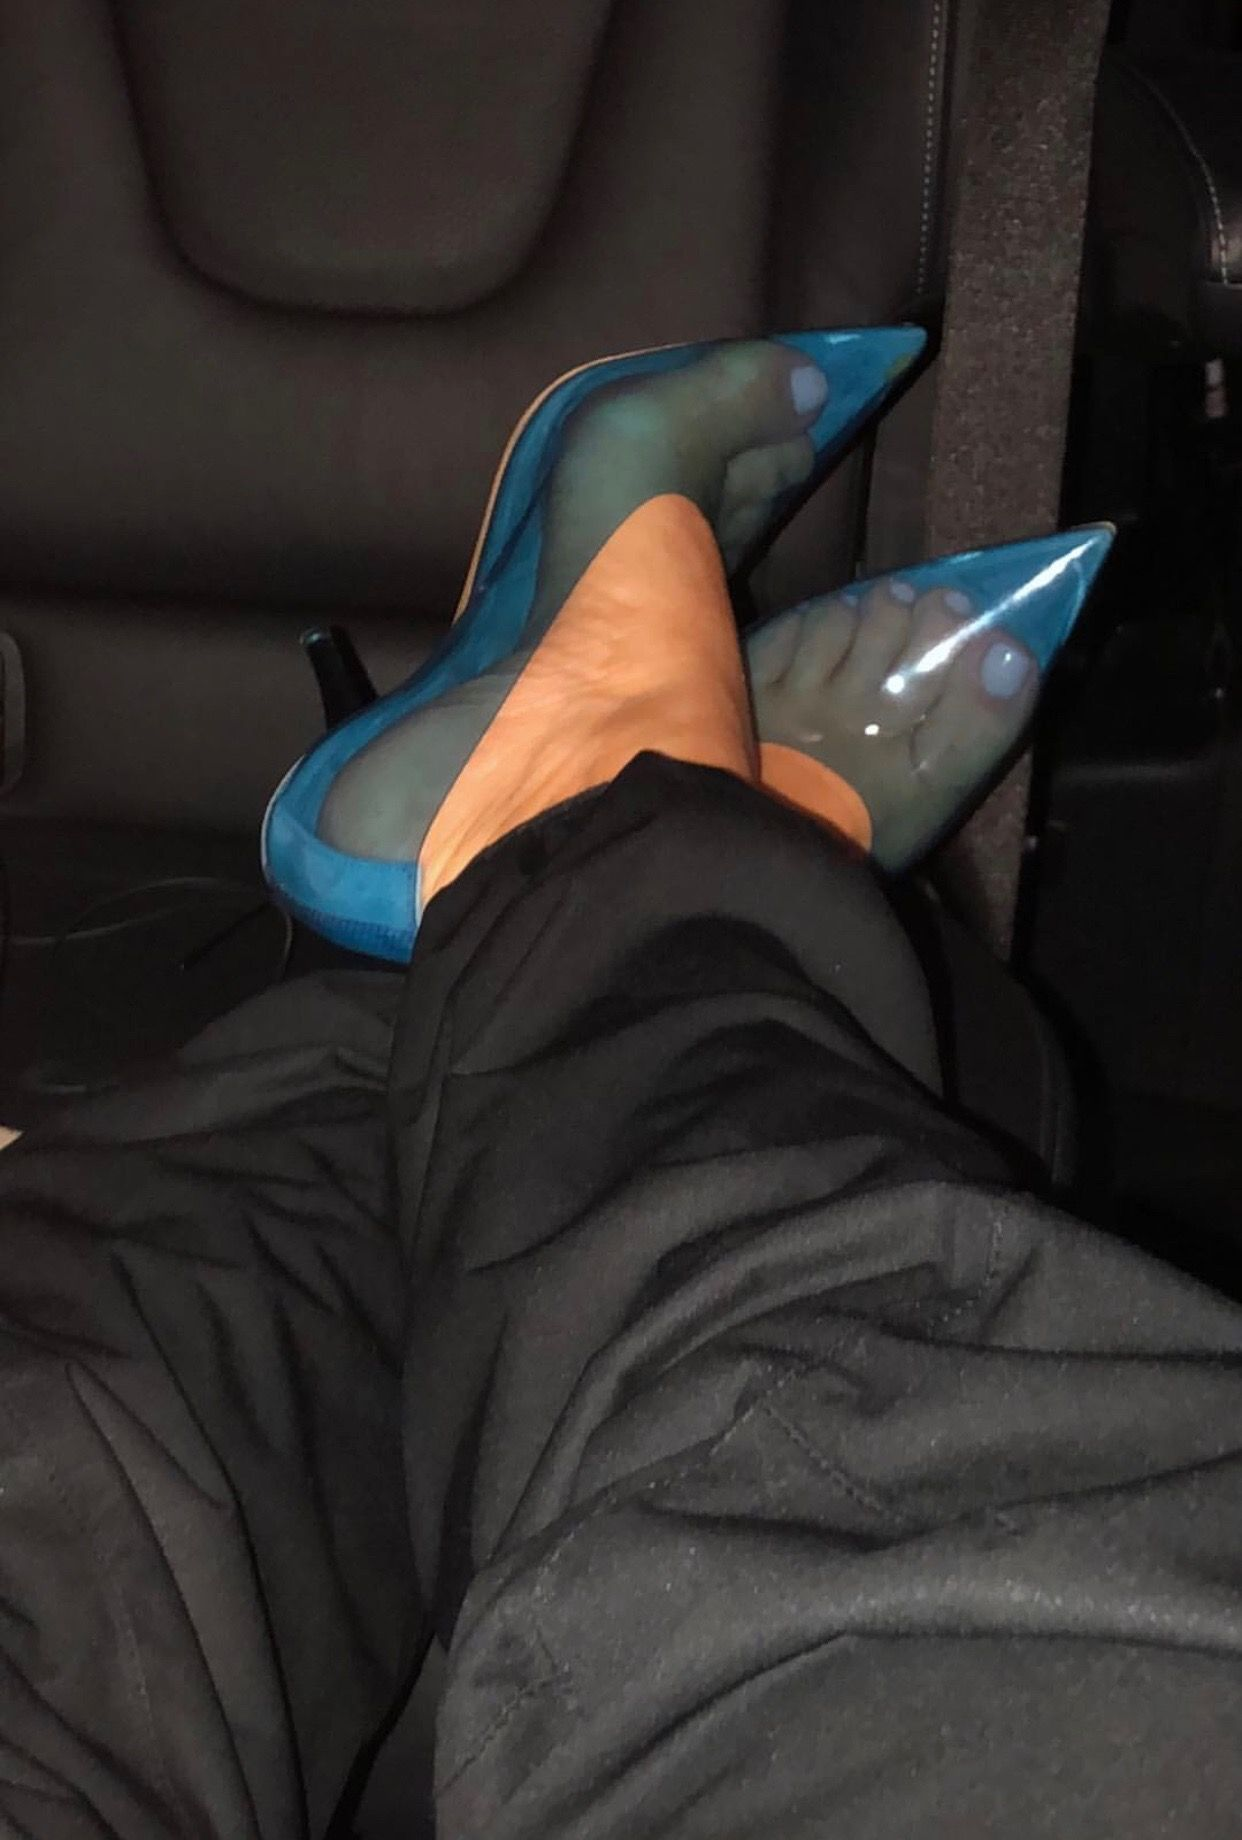 1e4c3c039 Kim Kardashian in yeezy season 7 blue Perspex heels